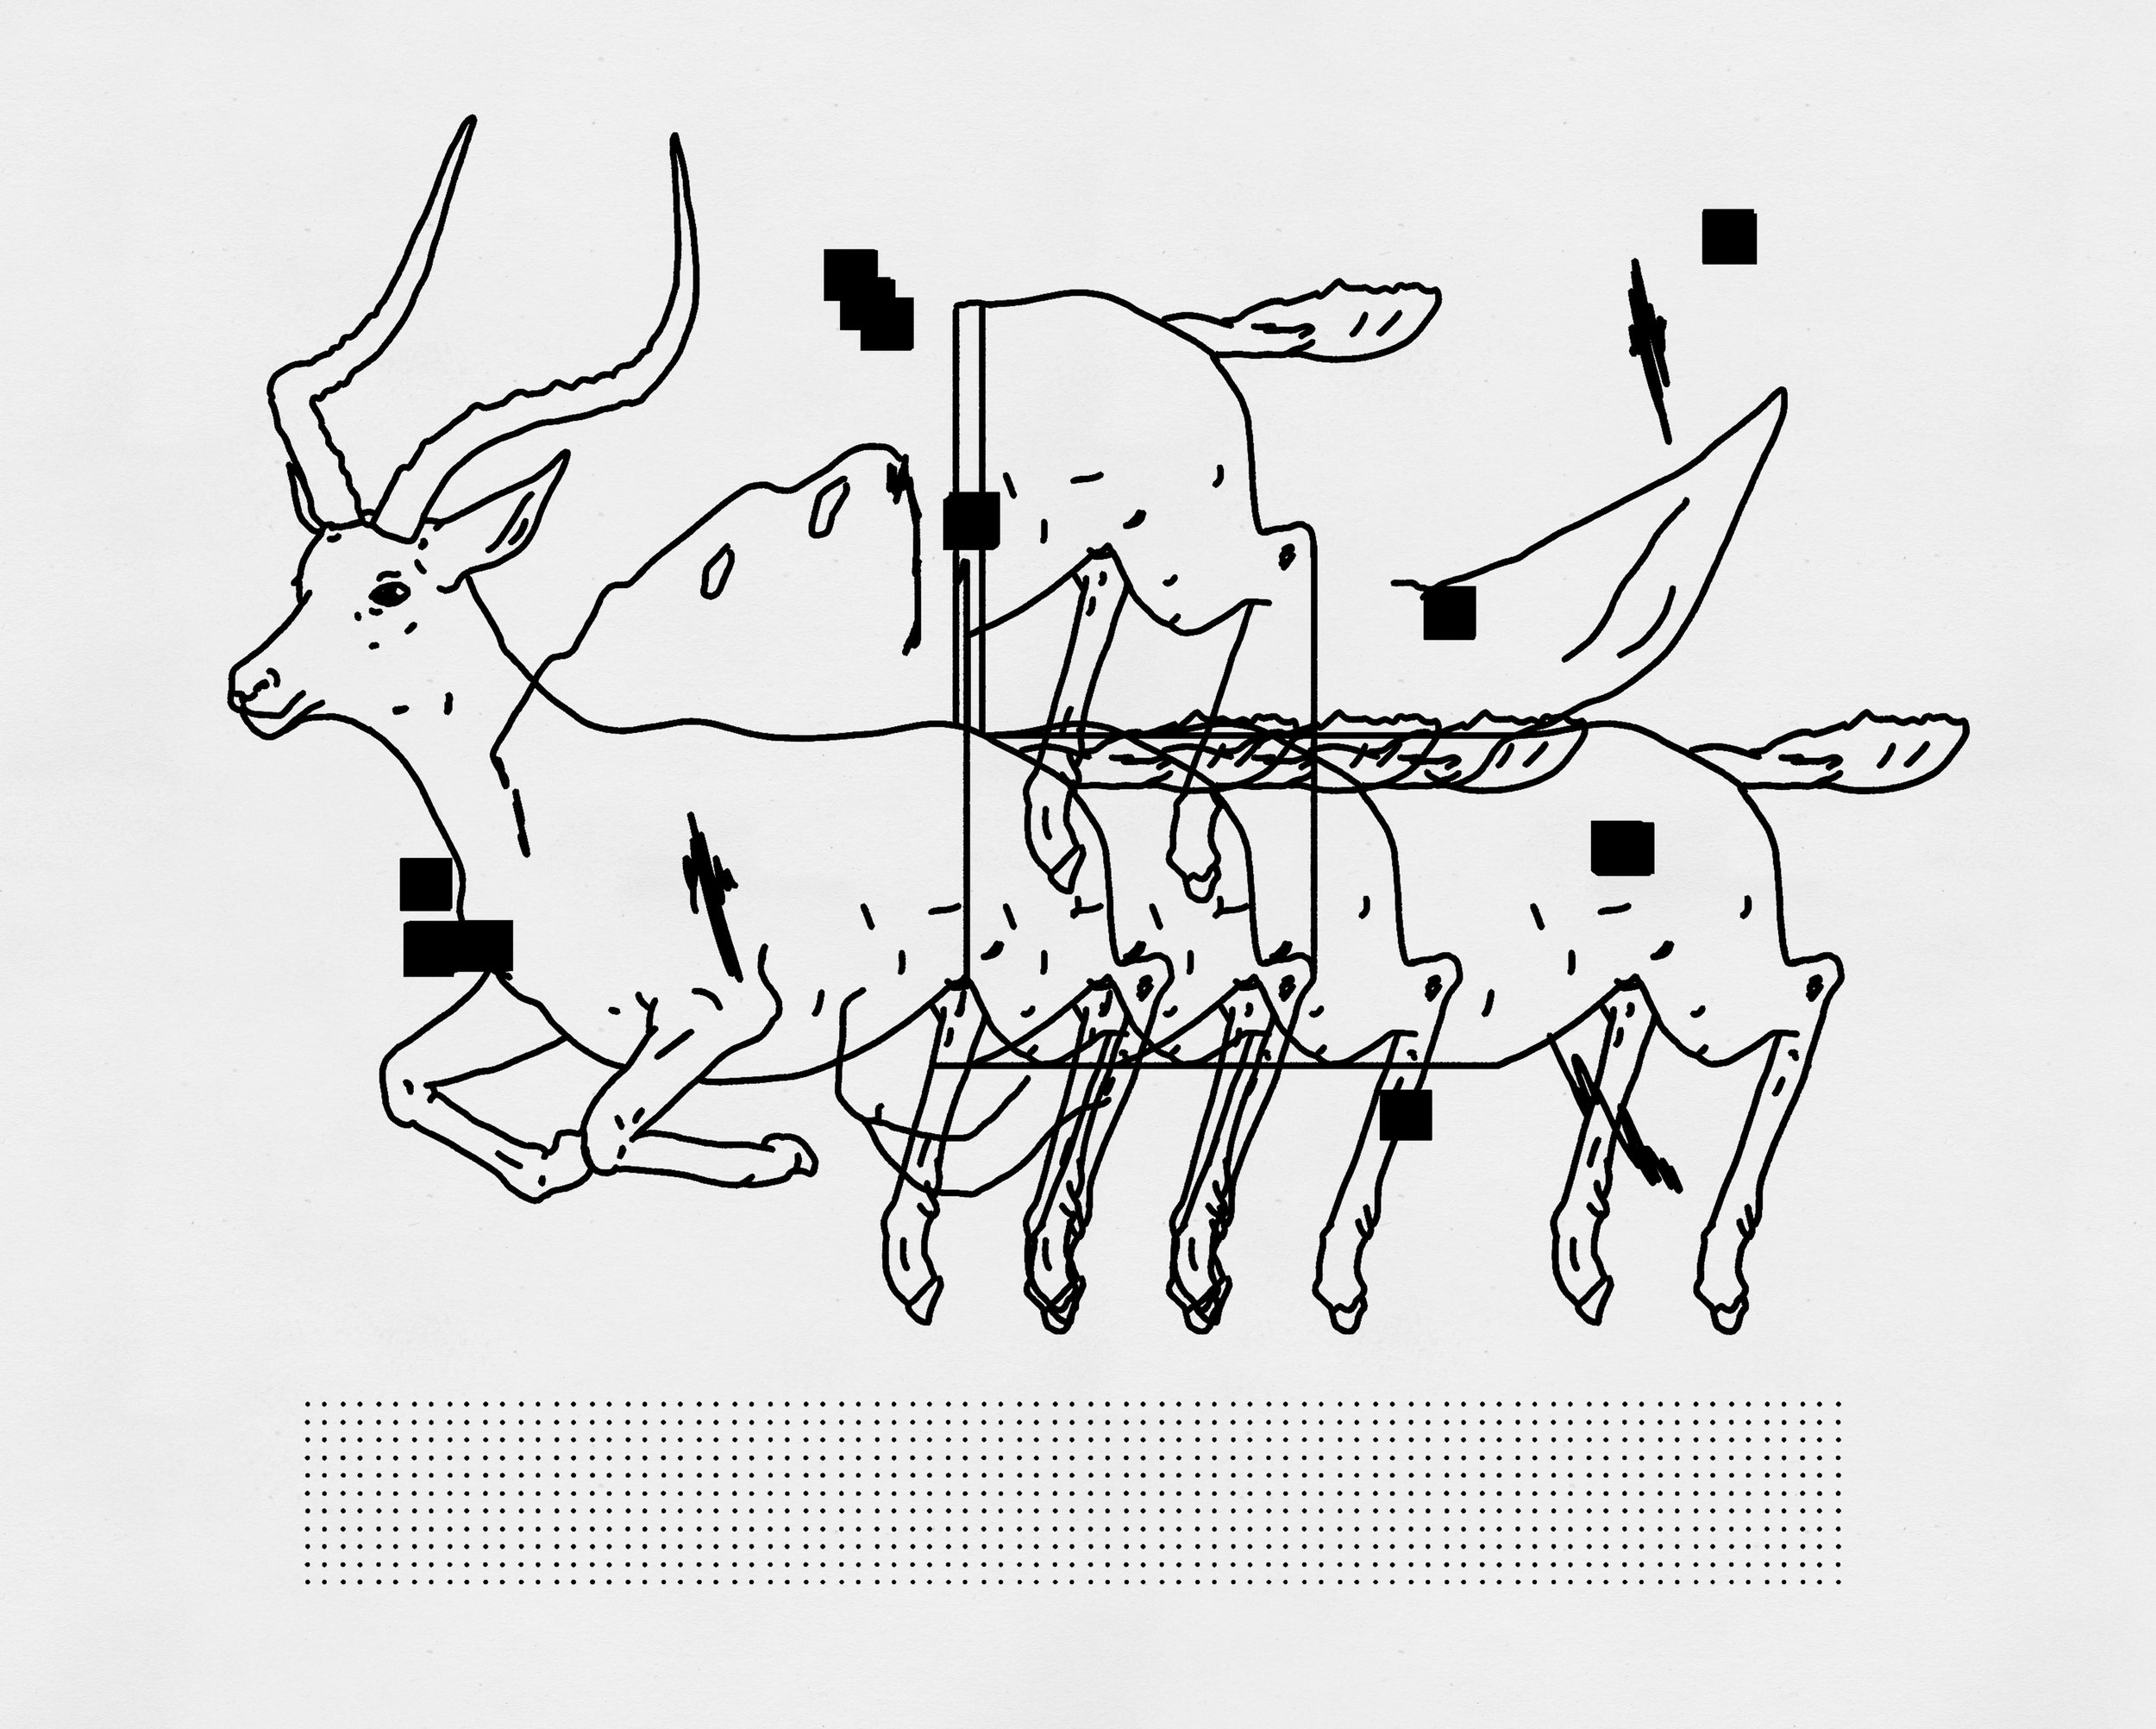 %22Impresión 3D%22 - 25 x 20 cm - Fine art print sobre papel - Julián Brangold - 2018.jpg